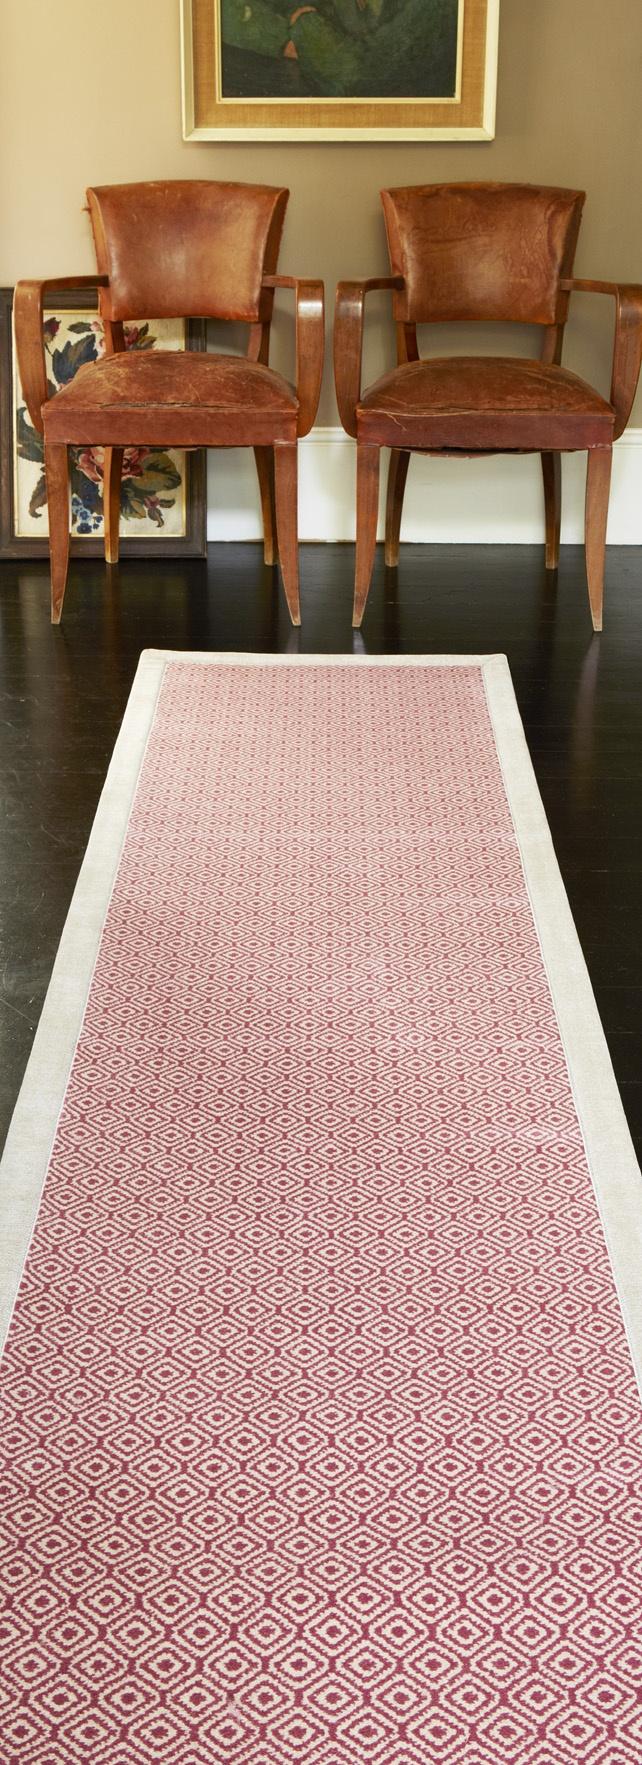 Make Me A Rug Alternative Flooring